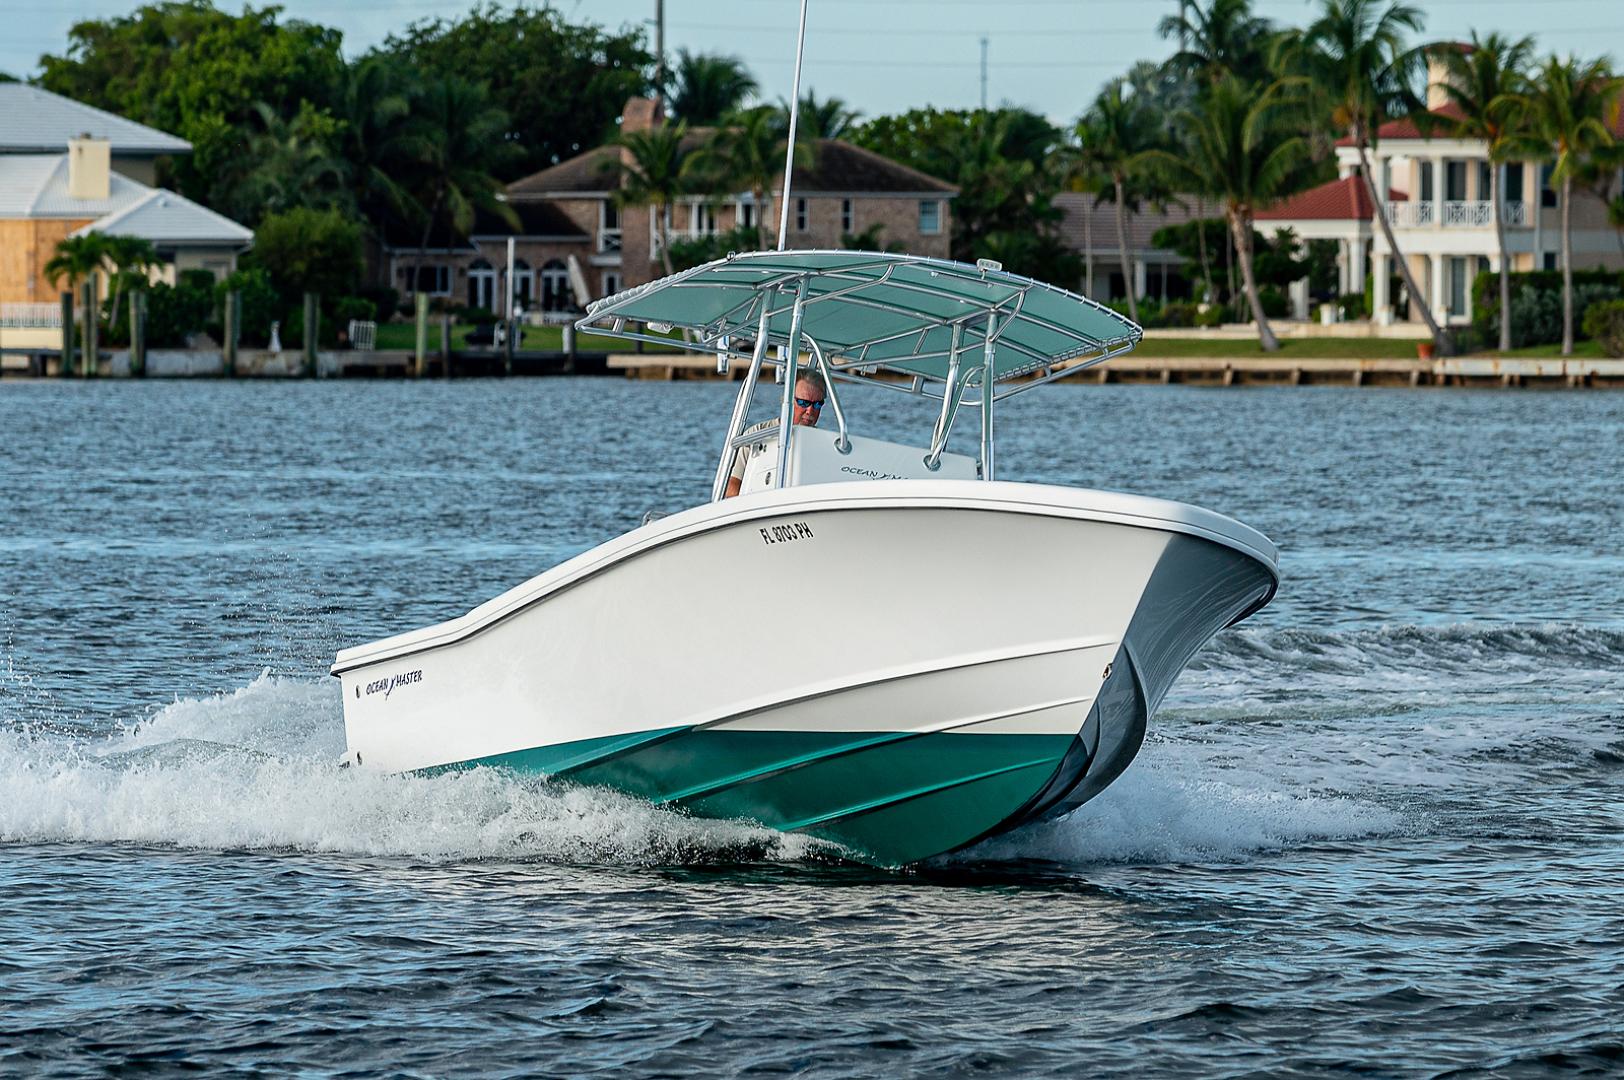 Ocean Master 2013-27 Ocean Master Palm Beach-Florida-United States-27 Ocean Master-1501380 | Thumbnail